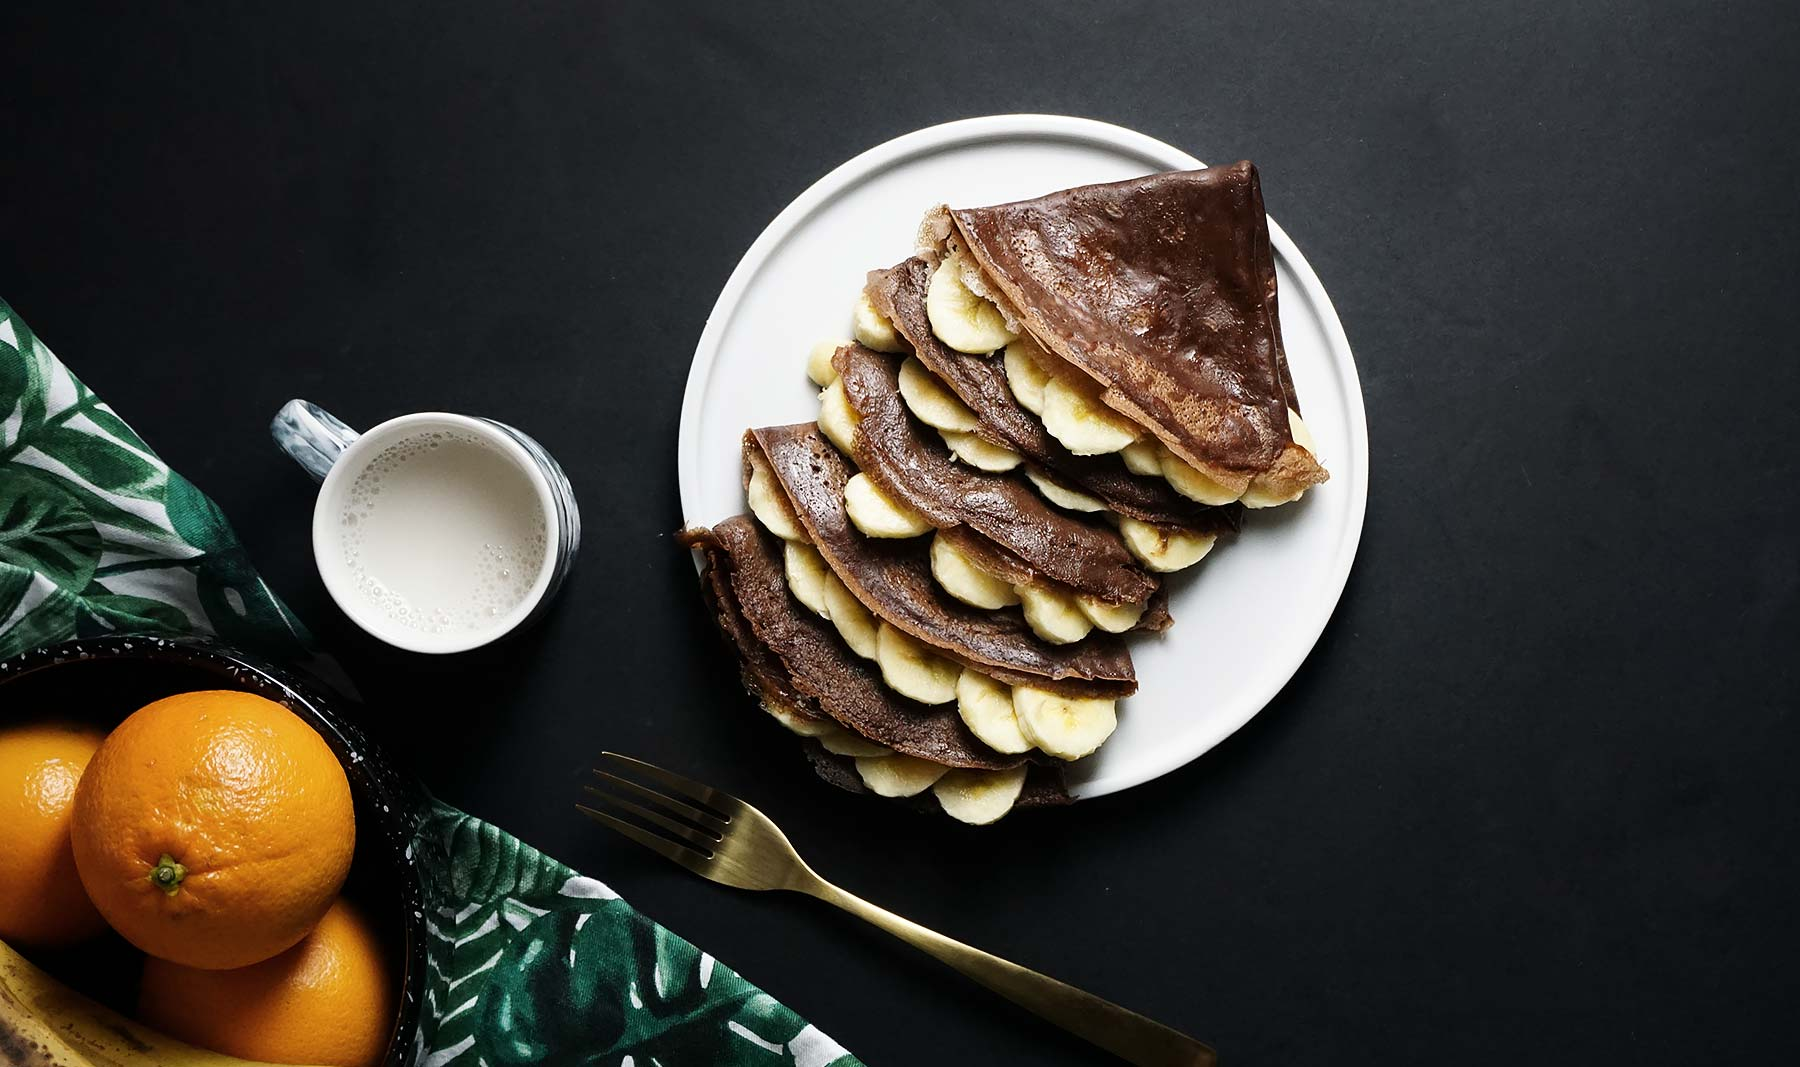 Crêpes de chocolate con plátano